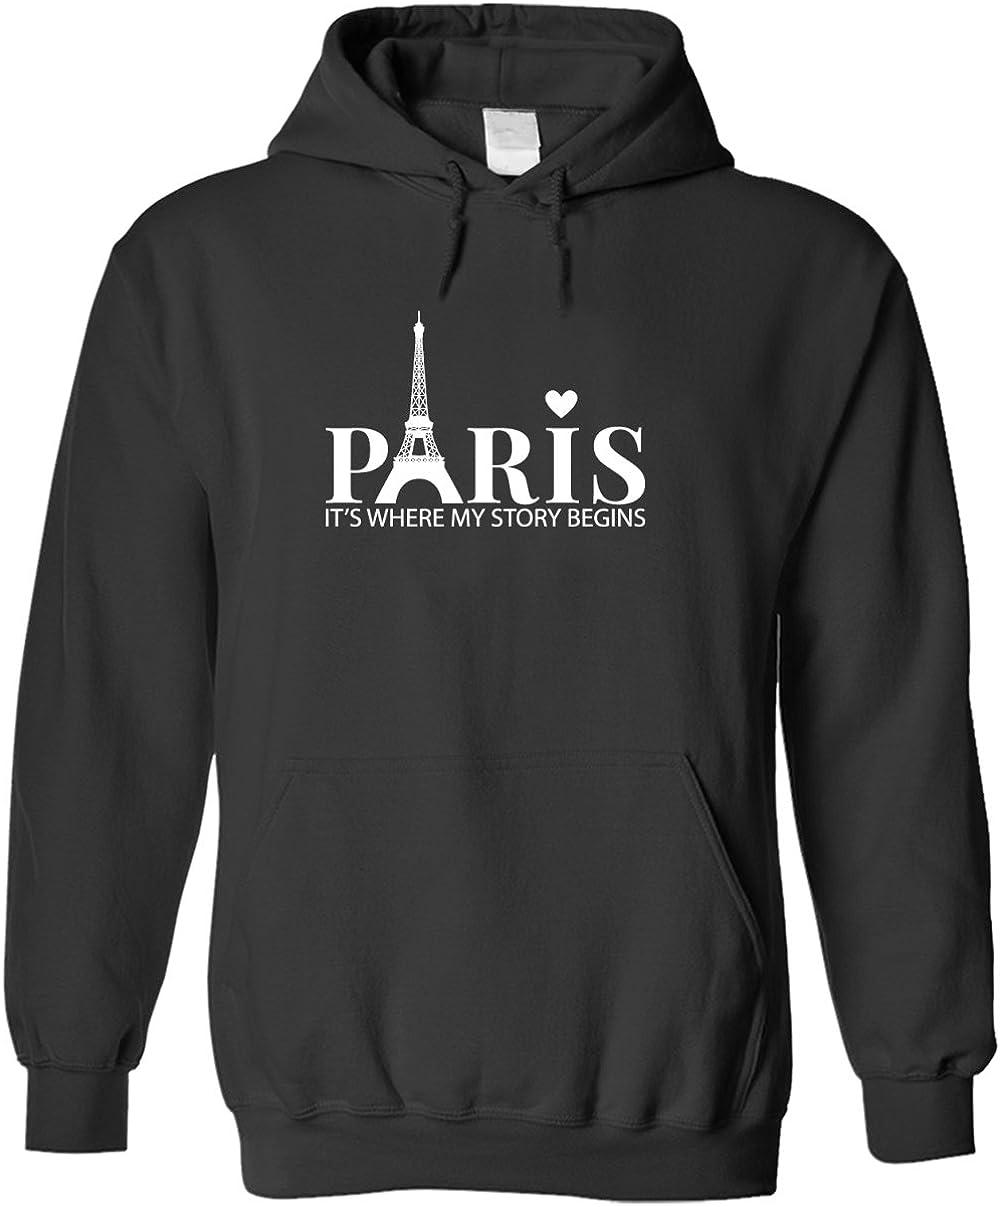 schlecht Bananas Paris, It'S Where meine Story Begins - Unisex Pullover Hoodie (Hooded Sweatshirt)